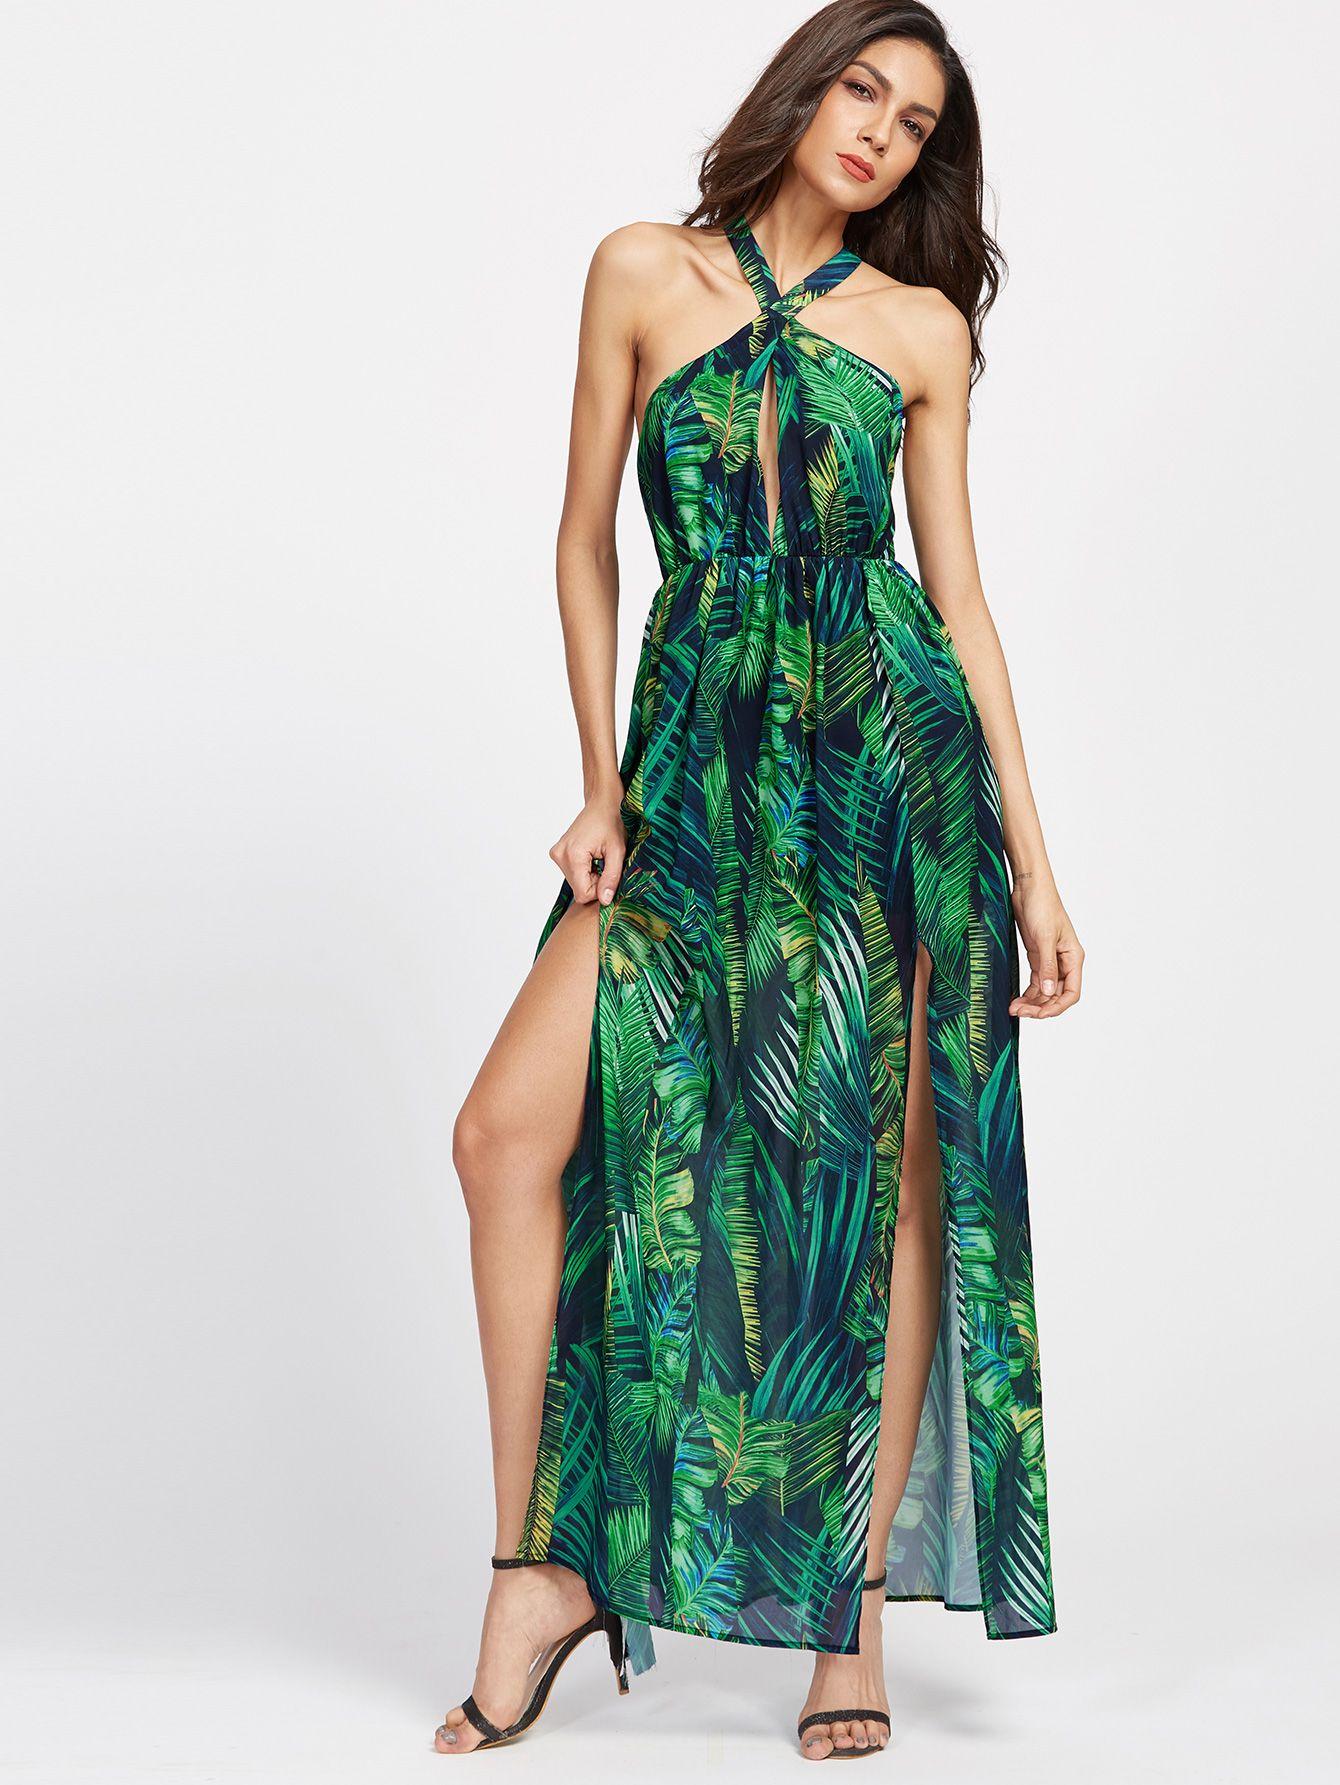 4bc2ec2d99 Shop Keyhole Cross Neck Foliage Print Backless M-Slit Dress online. SheIn  offers Keyhole